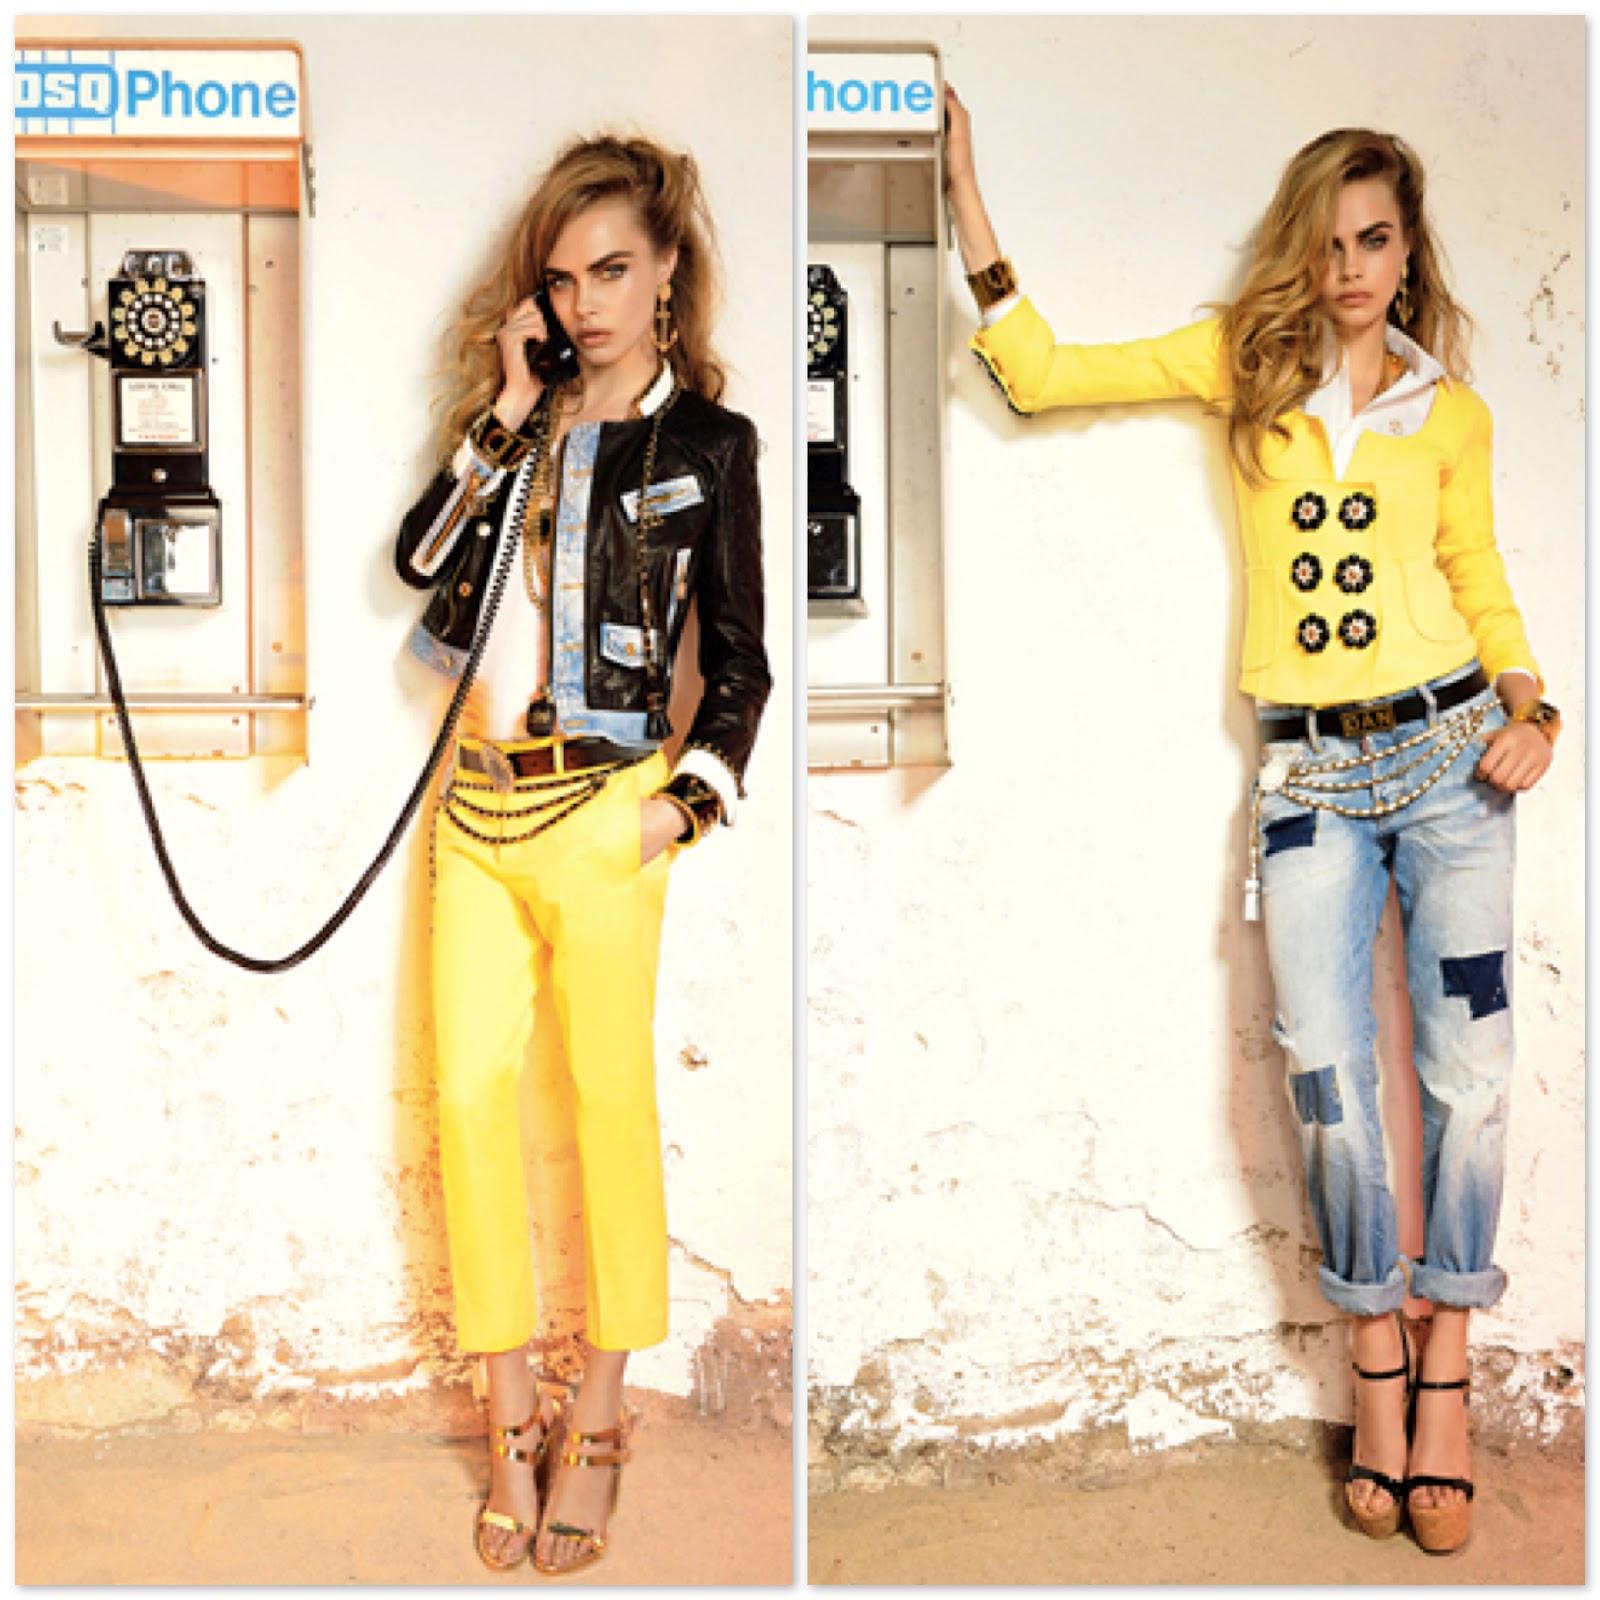 http://1.bp.blogspot.com/-oMAJv23Pgt0/T-iz0AV0NCI/AAAAAAAABHQ/tkOidNq5Tyw/s1600/yellow.jpg